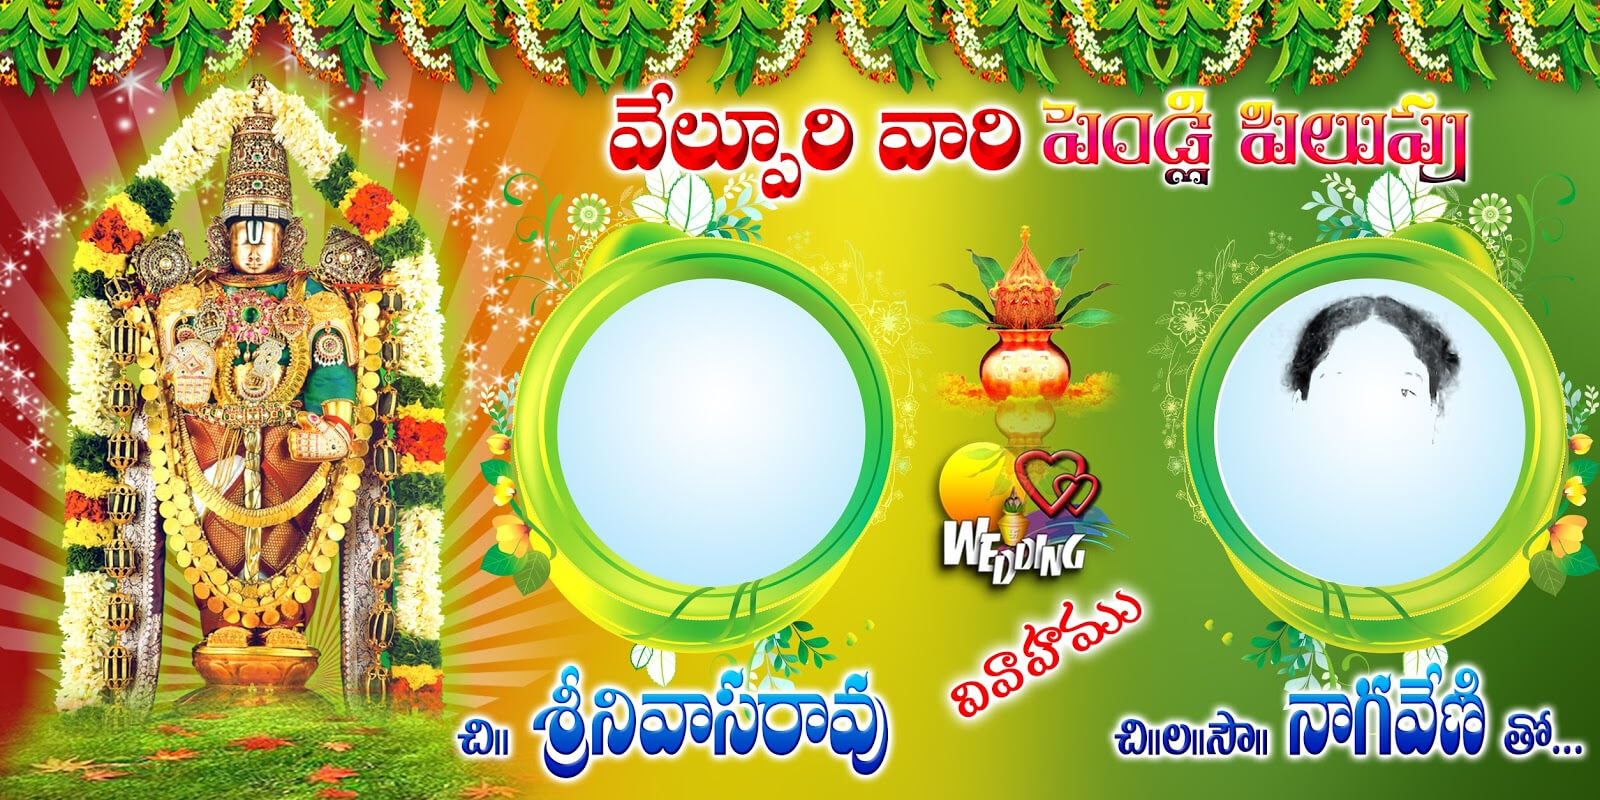 Wedding Banners Design Psd Template Free – Abhaya Ads | Flex Pertaining To Wedding Banner Design Templates